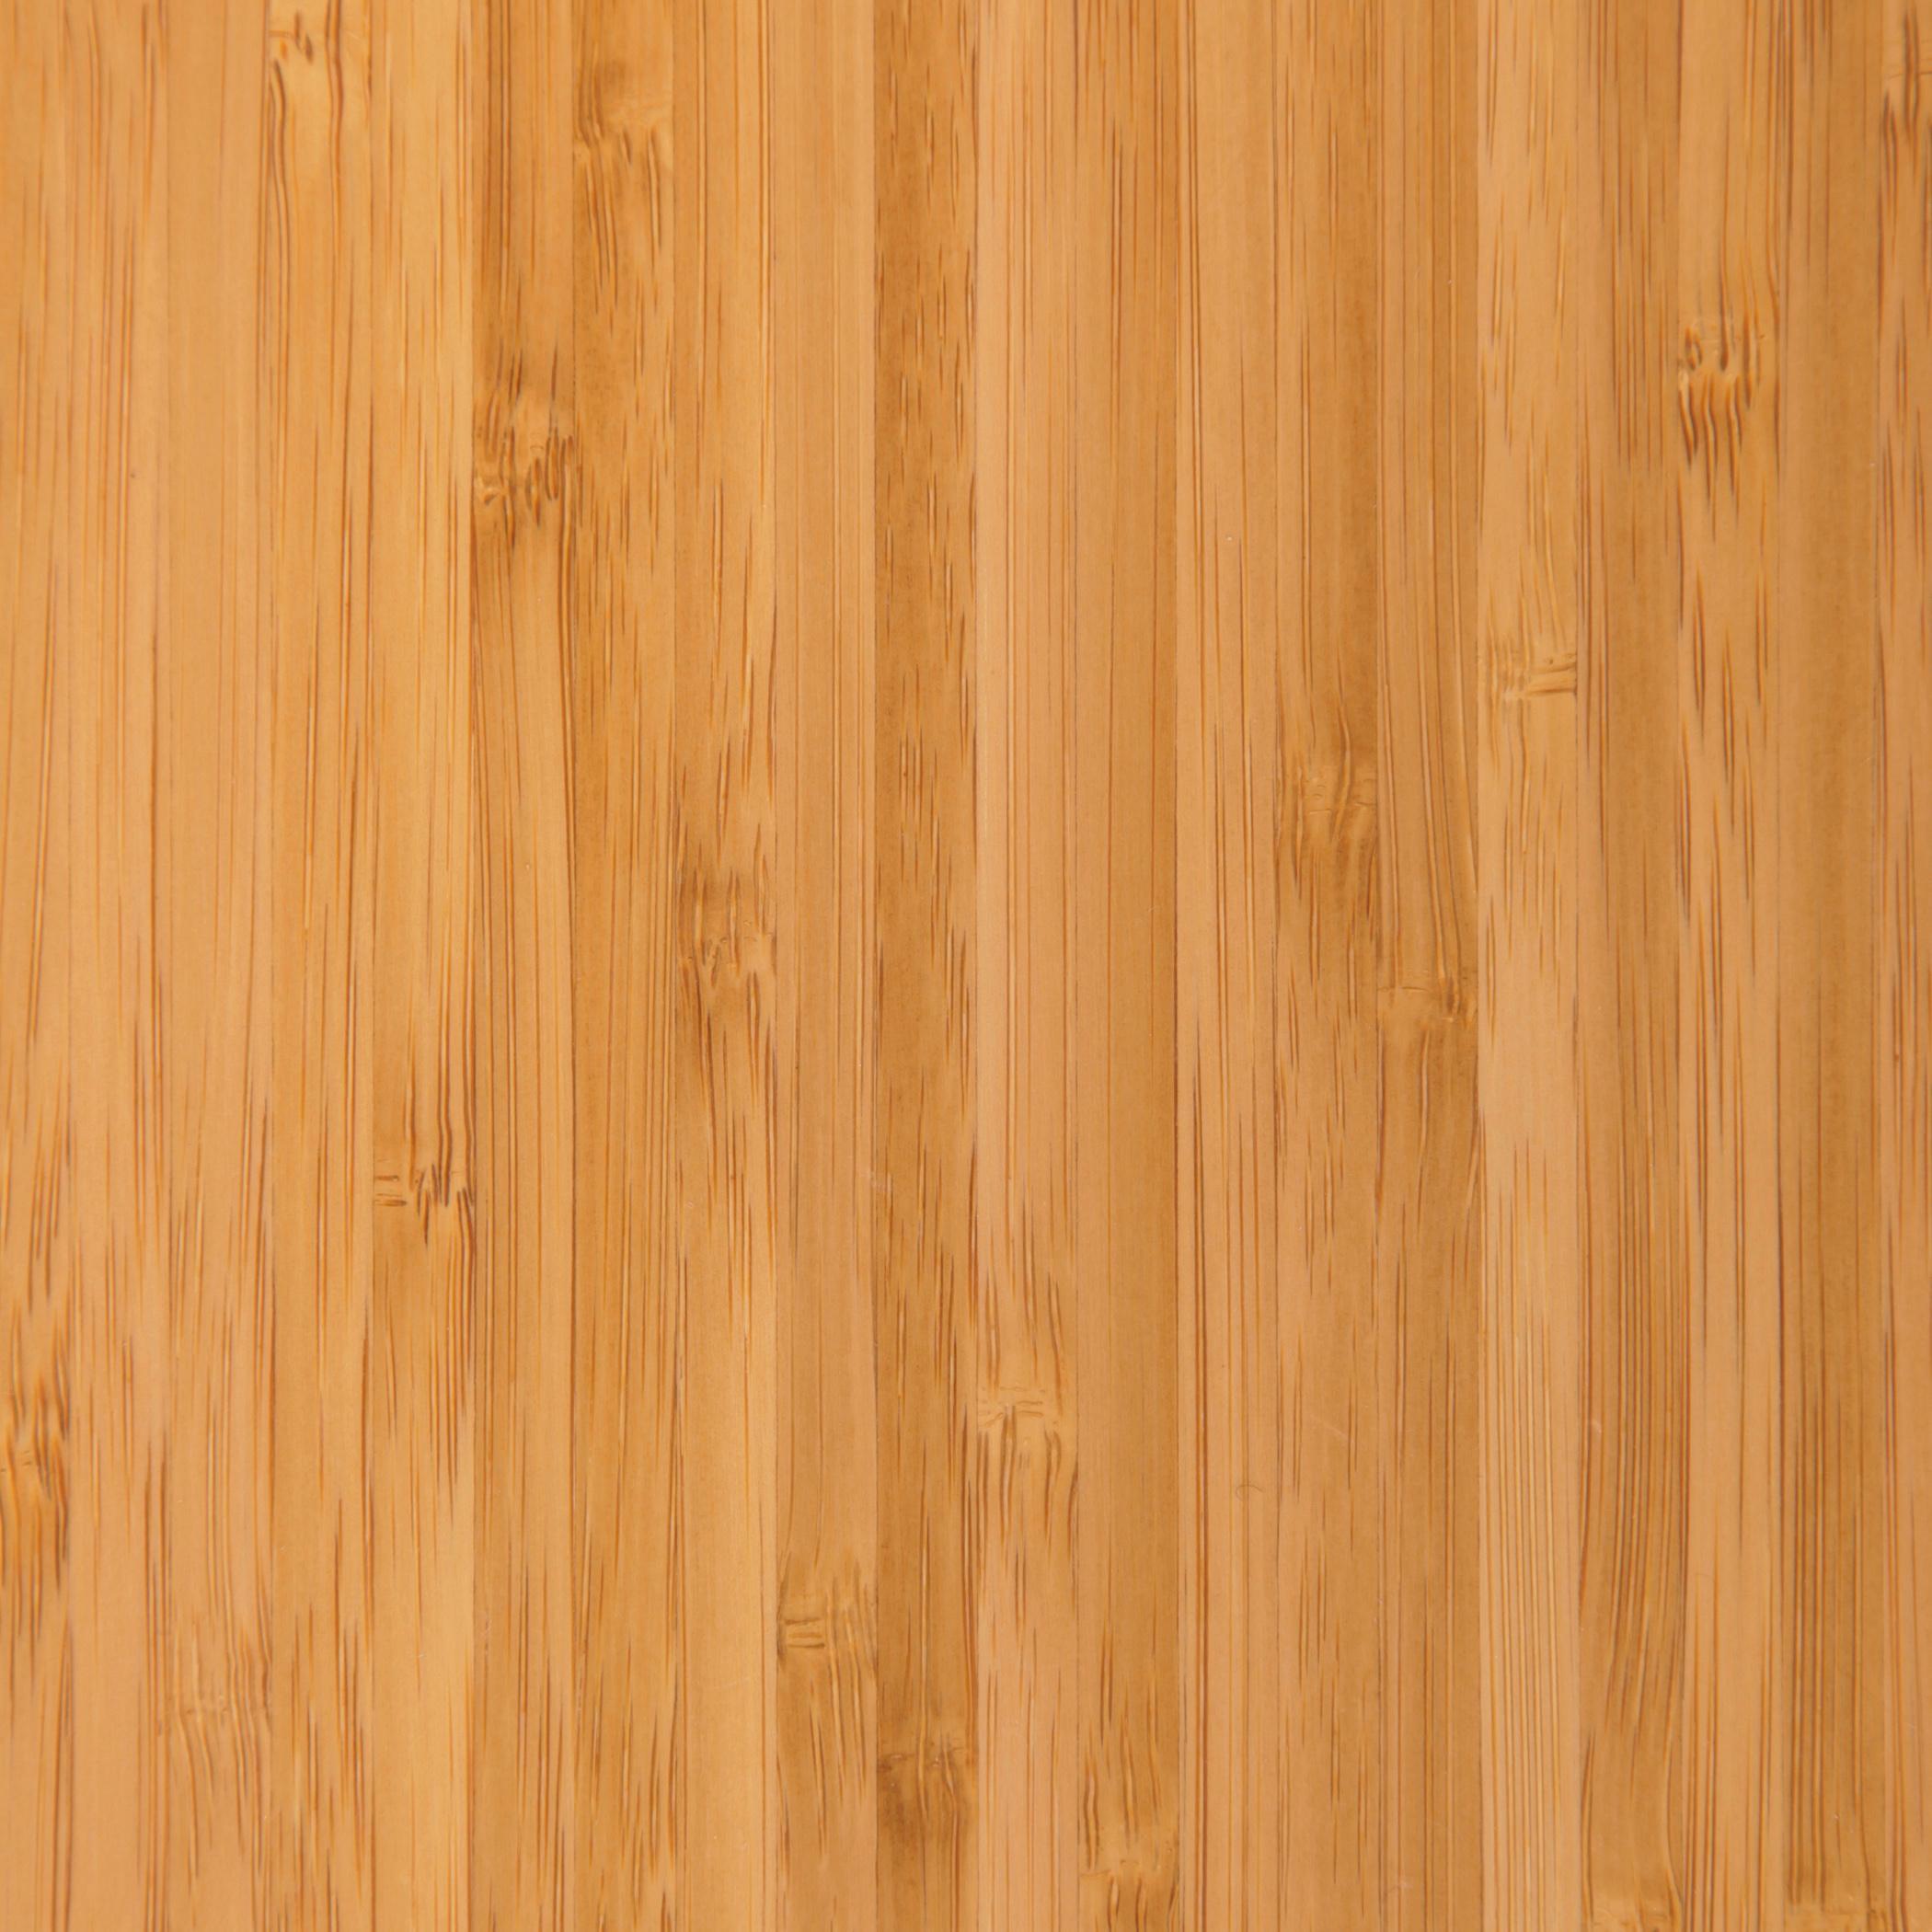 Amazon Anji Mountain AMB0500 1002 Trifold Bamboo Chairmat